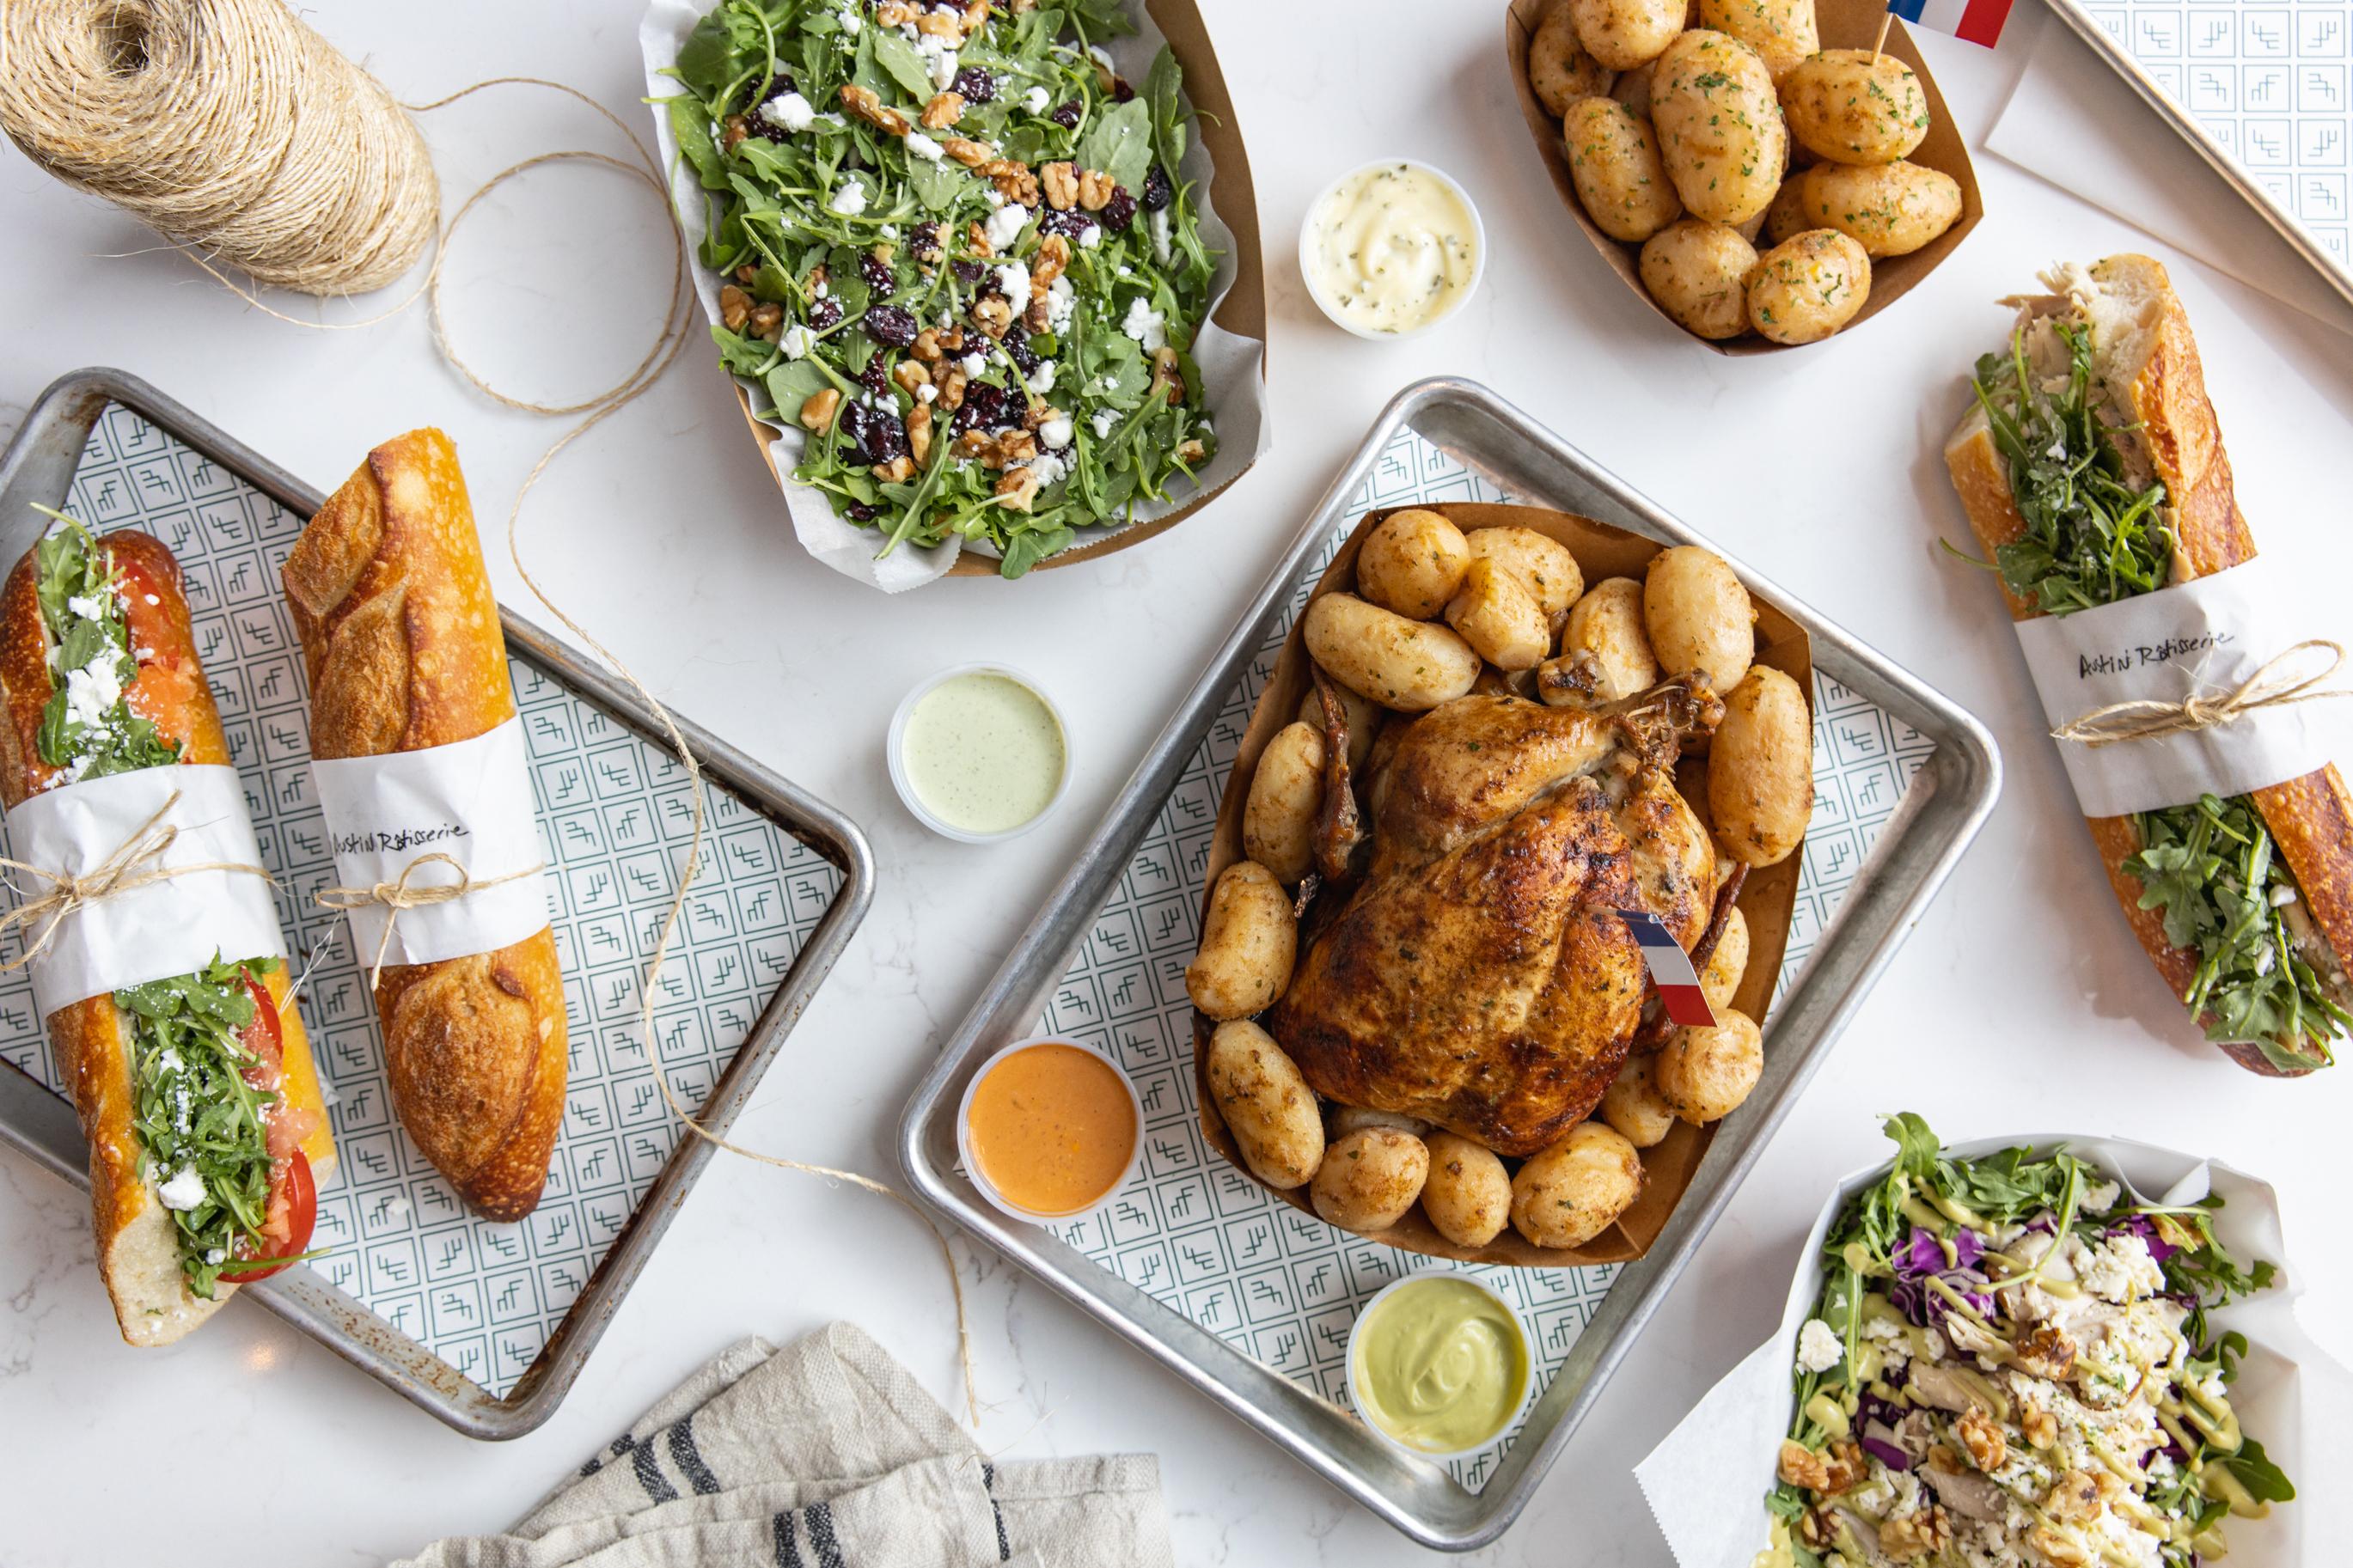 Rotisserie chicken, sandwiches, salads, and more from Austin Rotisserie